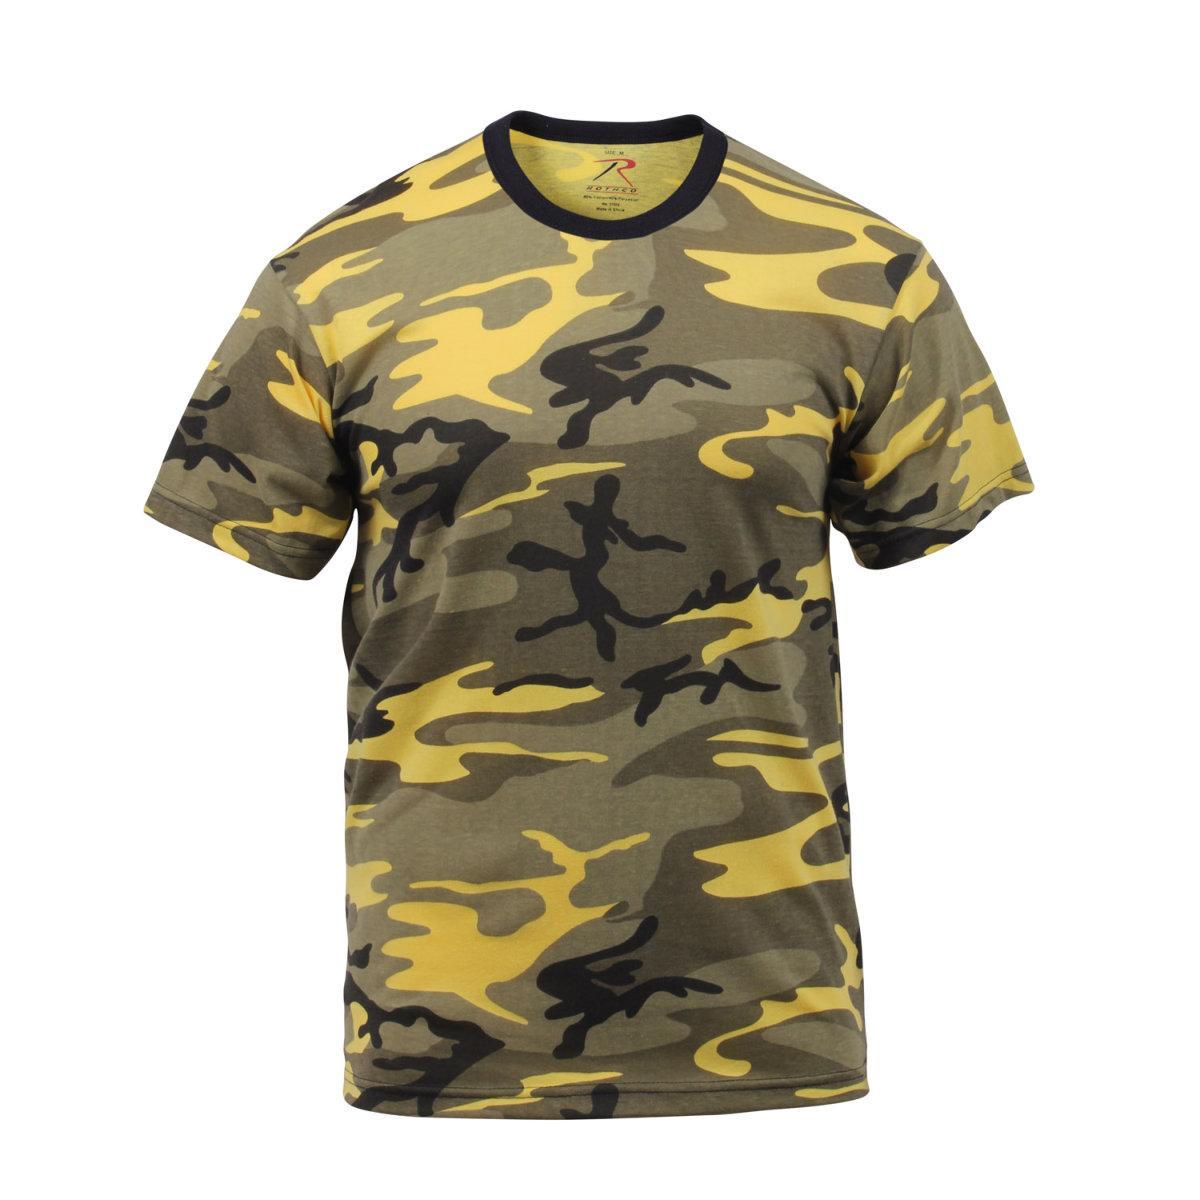 Stinger Yellow Camouflage T-Shirt